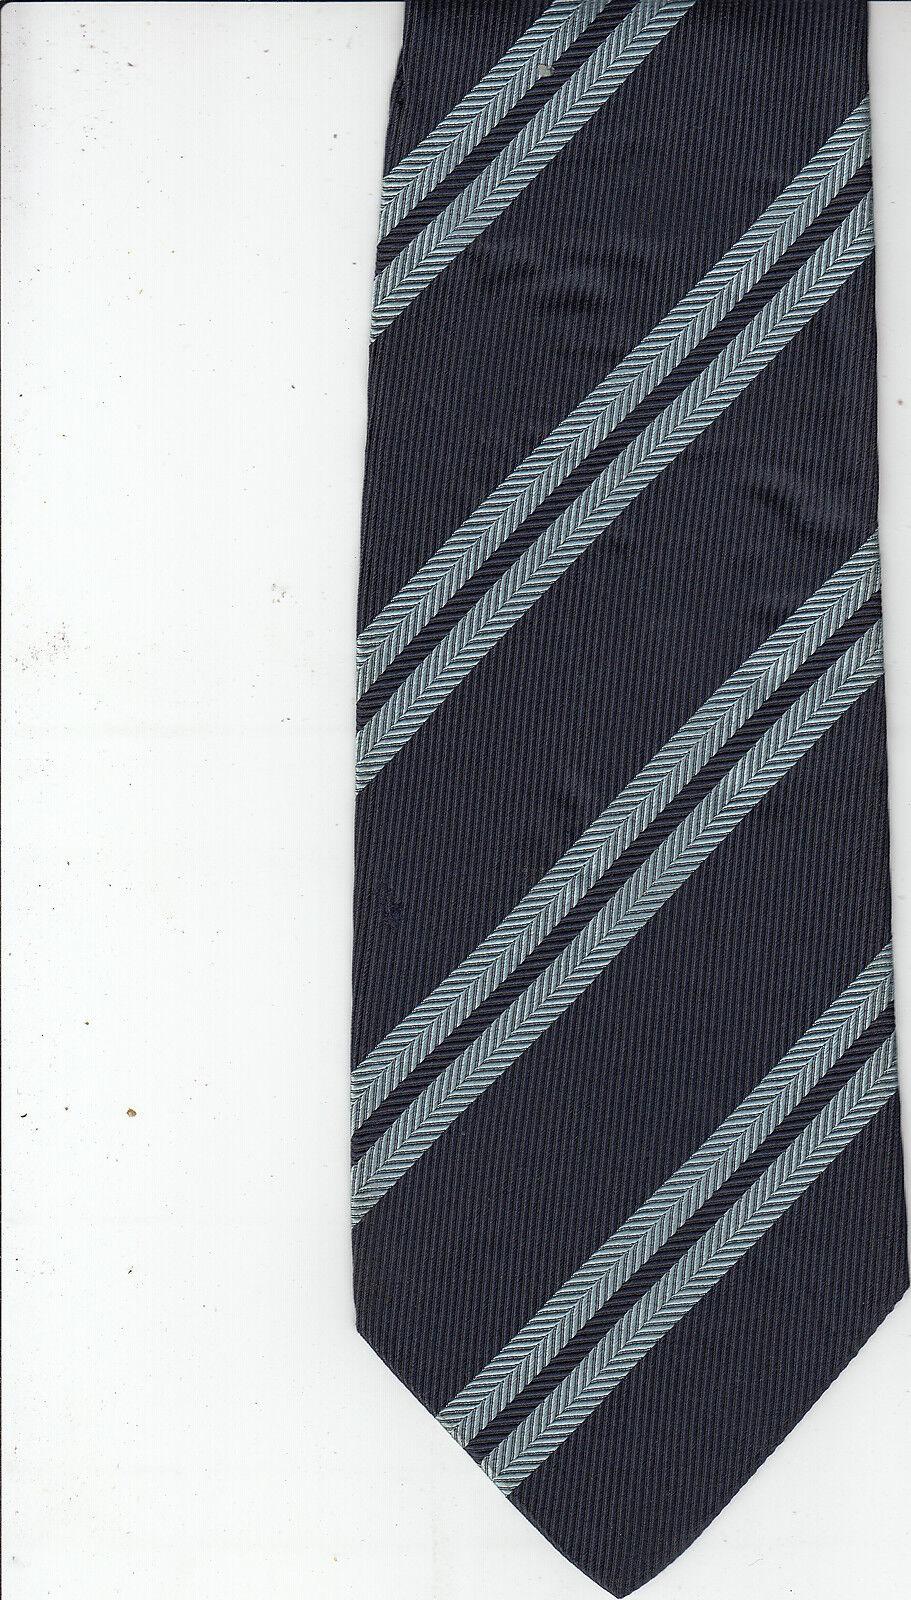 Pierre Balmain-Authentic-100% Silk Tie-Made In Italy-Ba7-Men's Tie